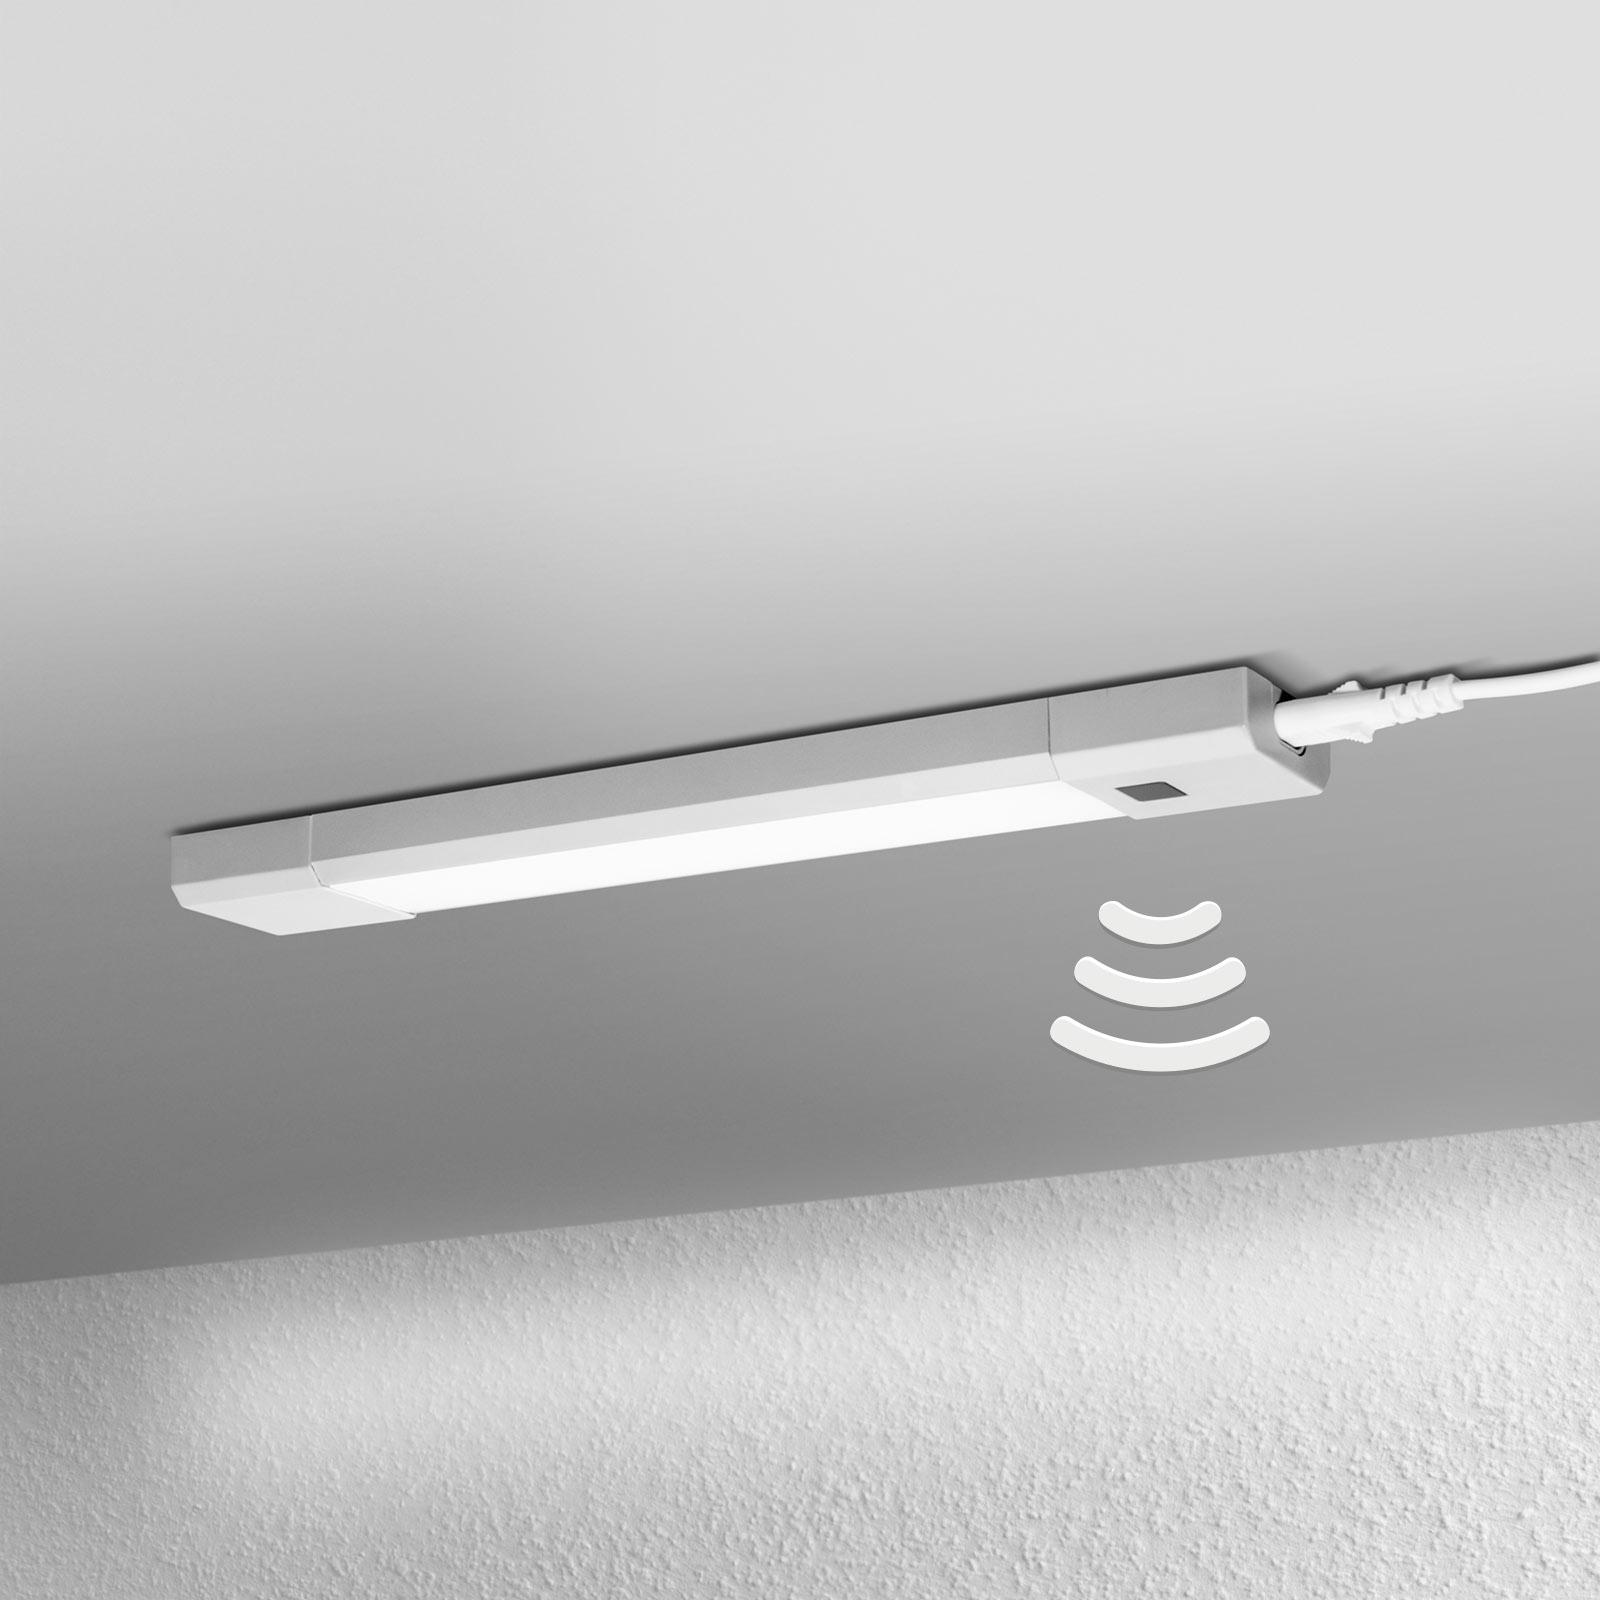 LEDVANCE Linear LED Slim -kaapinalusvalaisin 30 cm